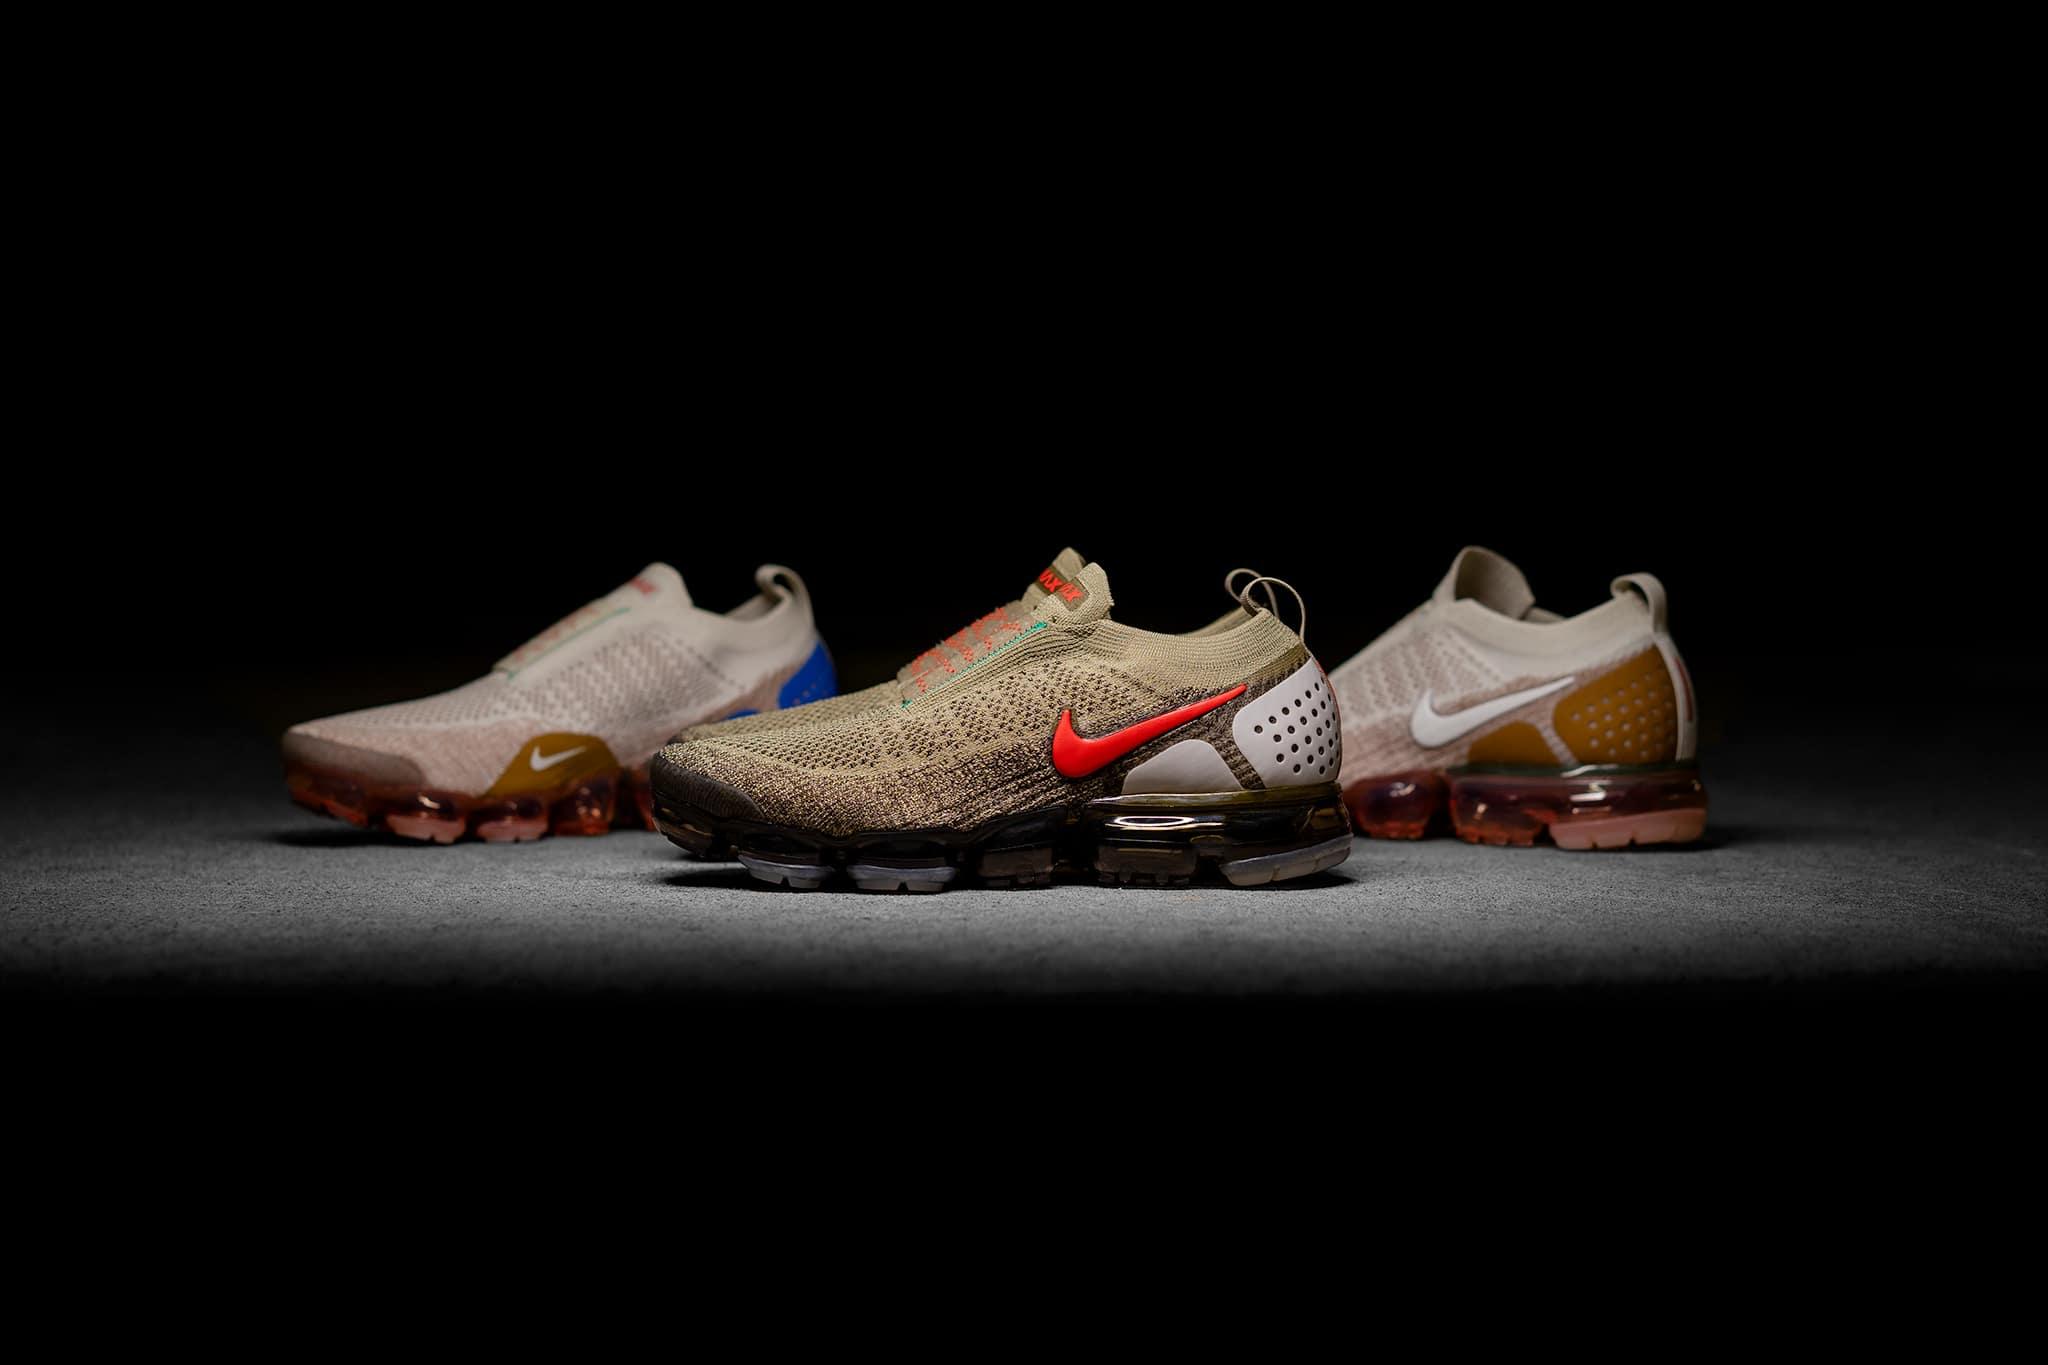 631720dbbf Nike-Air-Vapormax-FK-Moc-2-NEUTRAL-OLIVE-RED-News-Web-1_f9gkgo.jpg